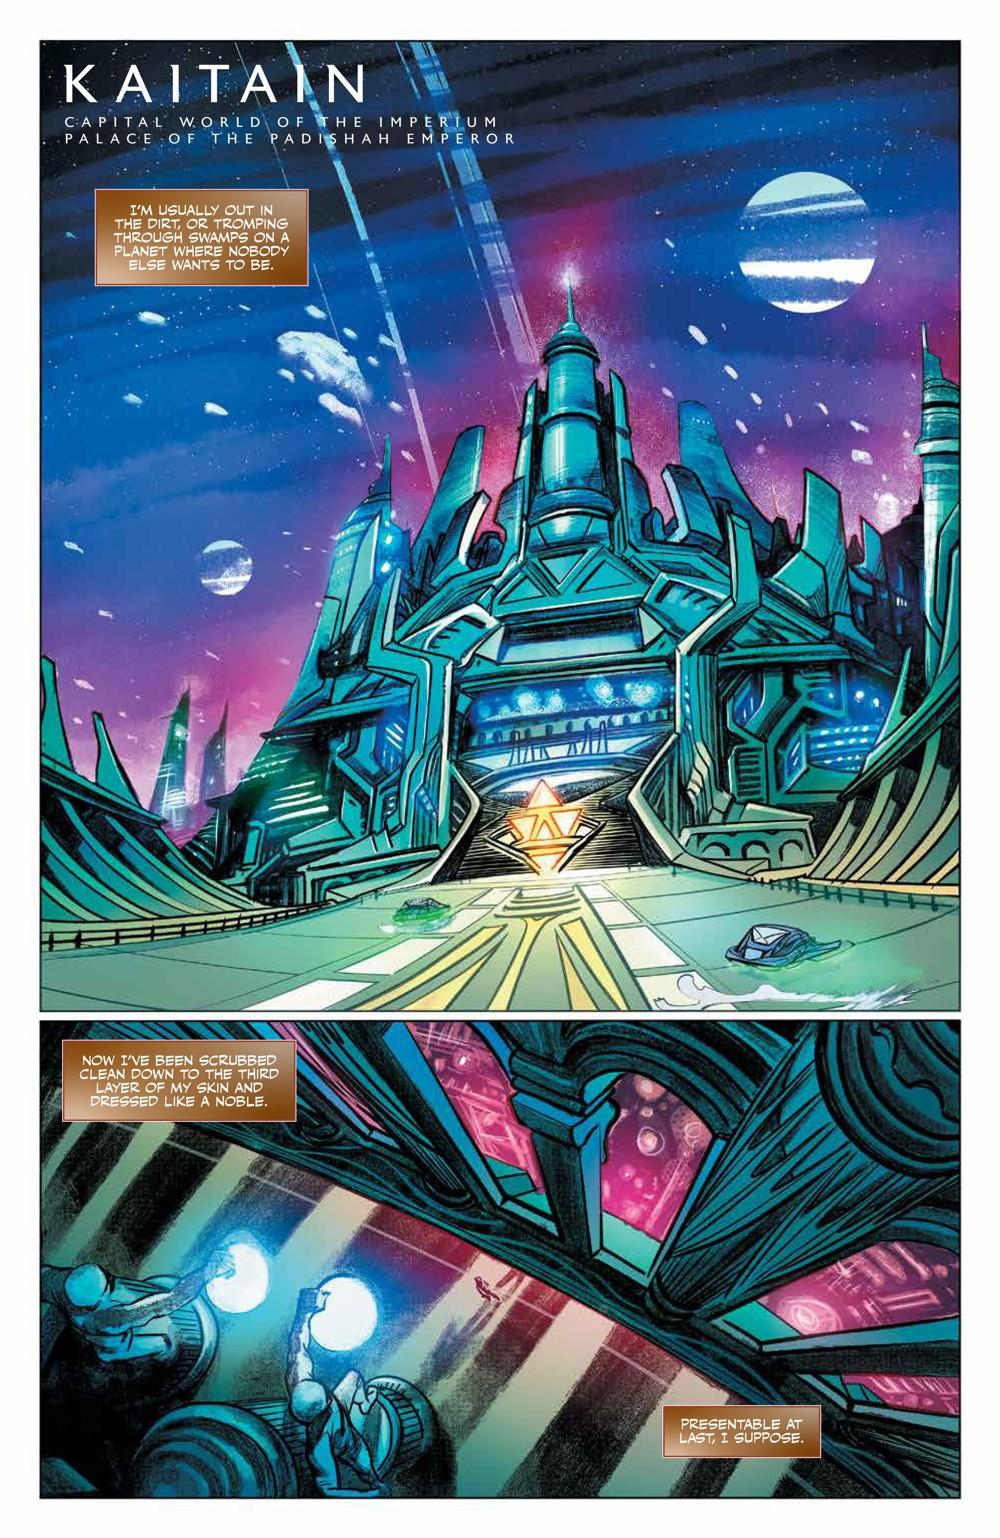 Dune_HouseAtreides_v1_HC_PRESS_13 ComicList Previews: DUNE HOUSE ATREIDES VOLUME 1 HC